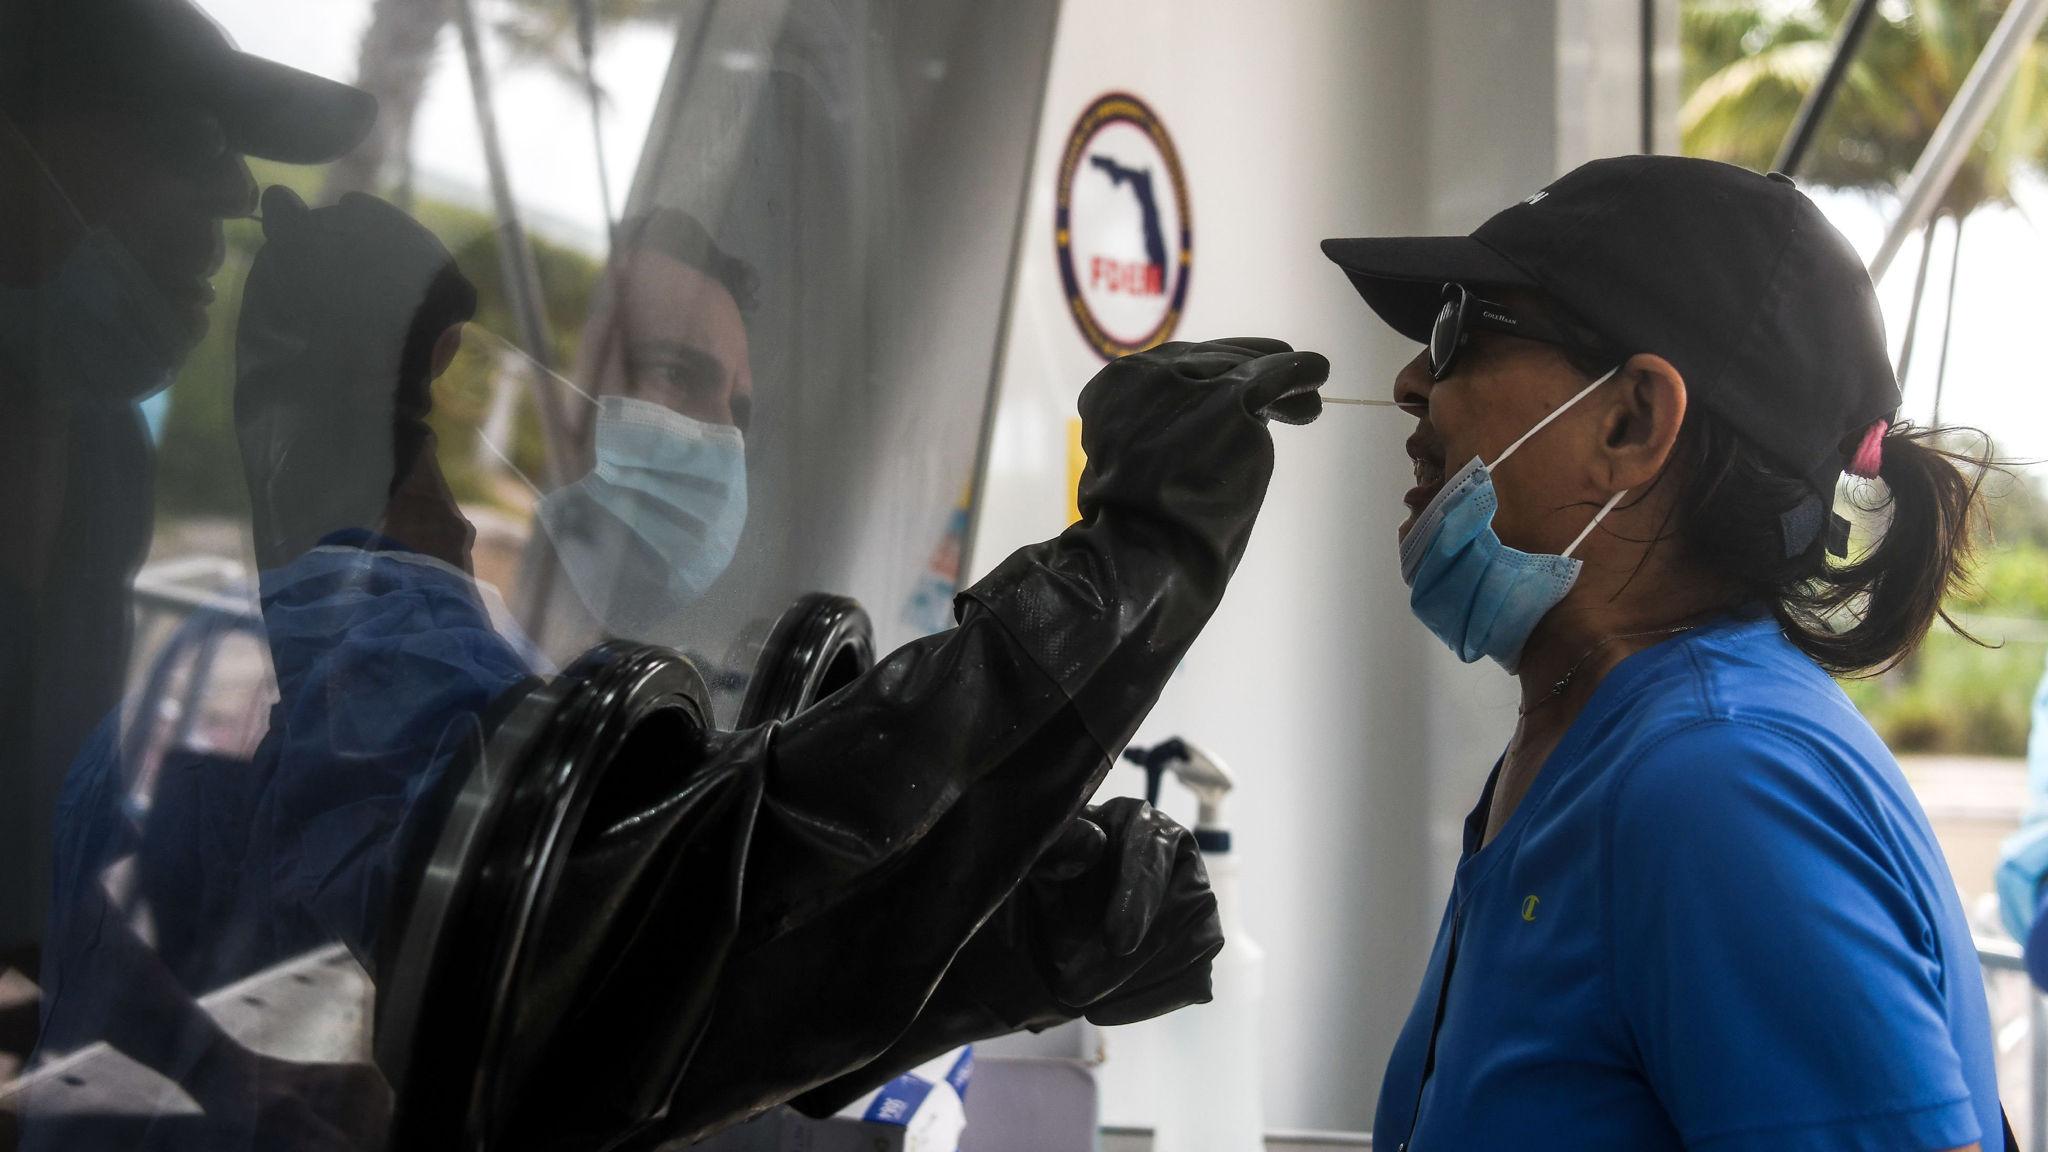 TESTING-FILES-US-HEALTH-VIRUS-FLORIDA